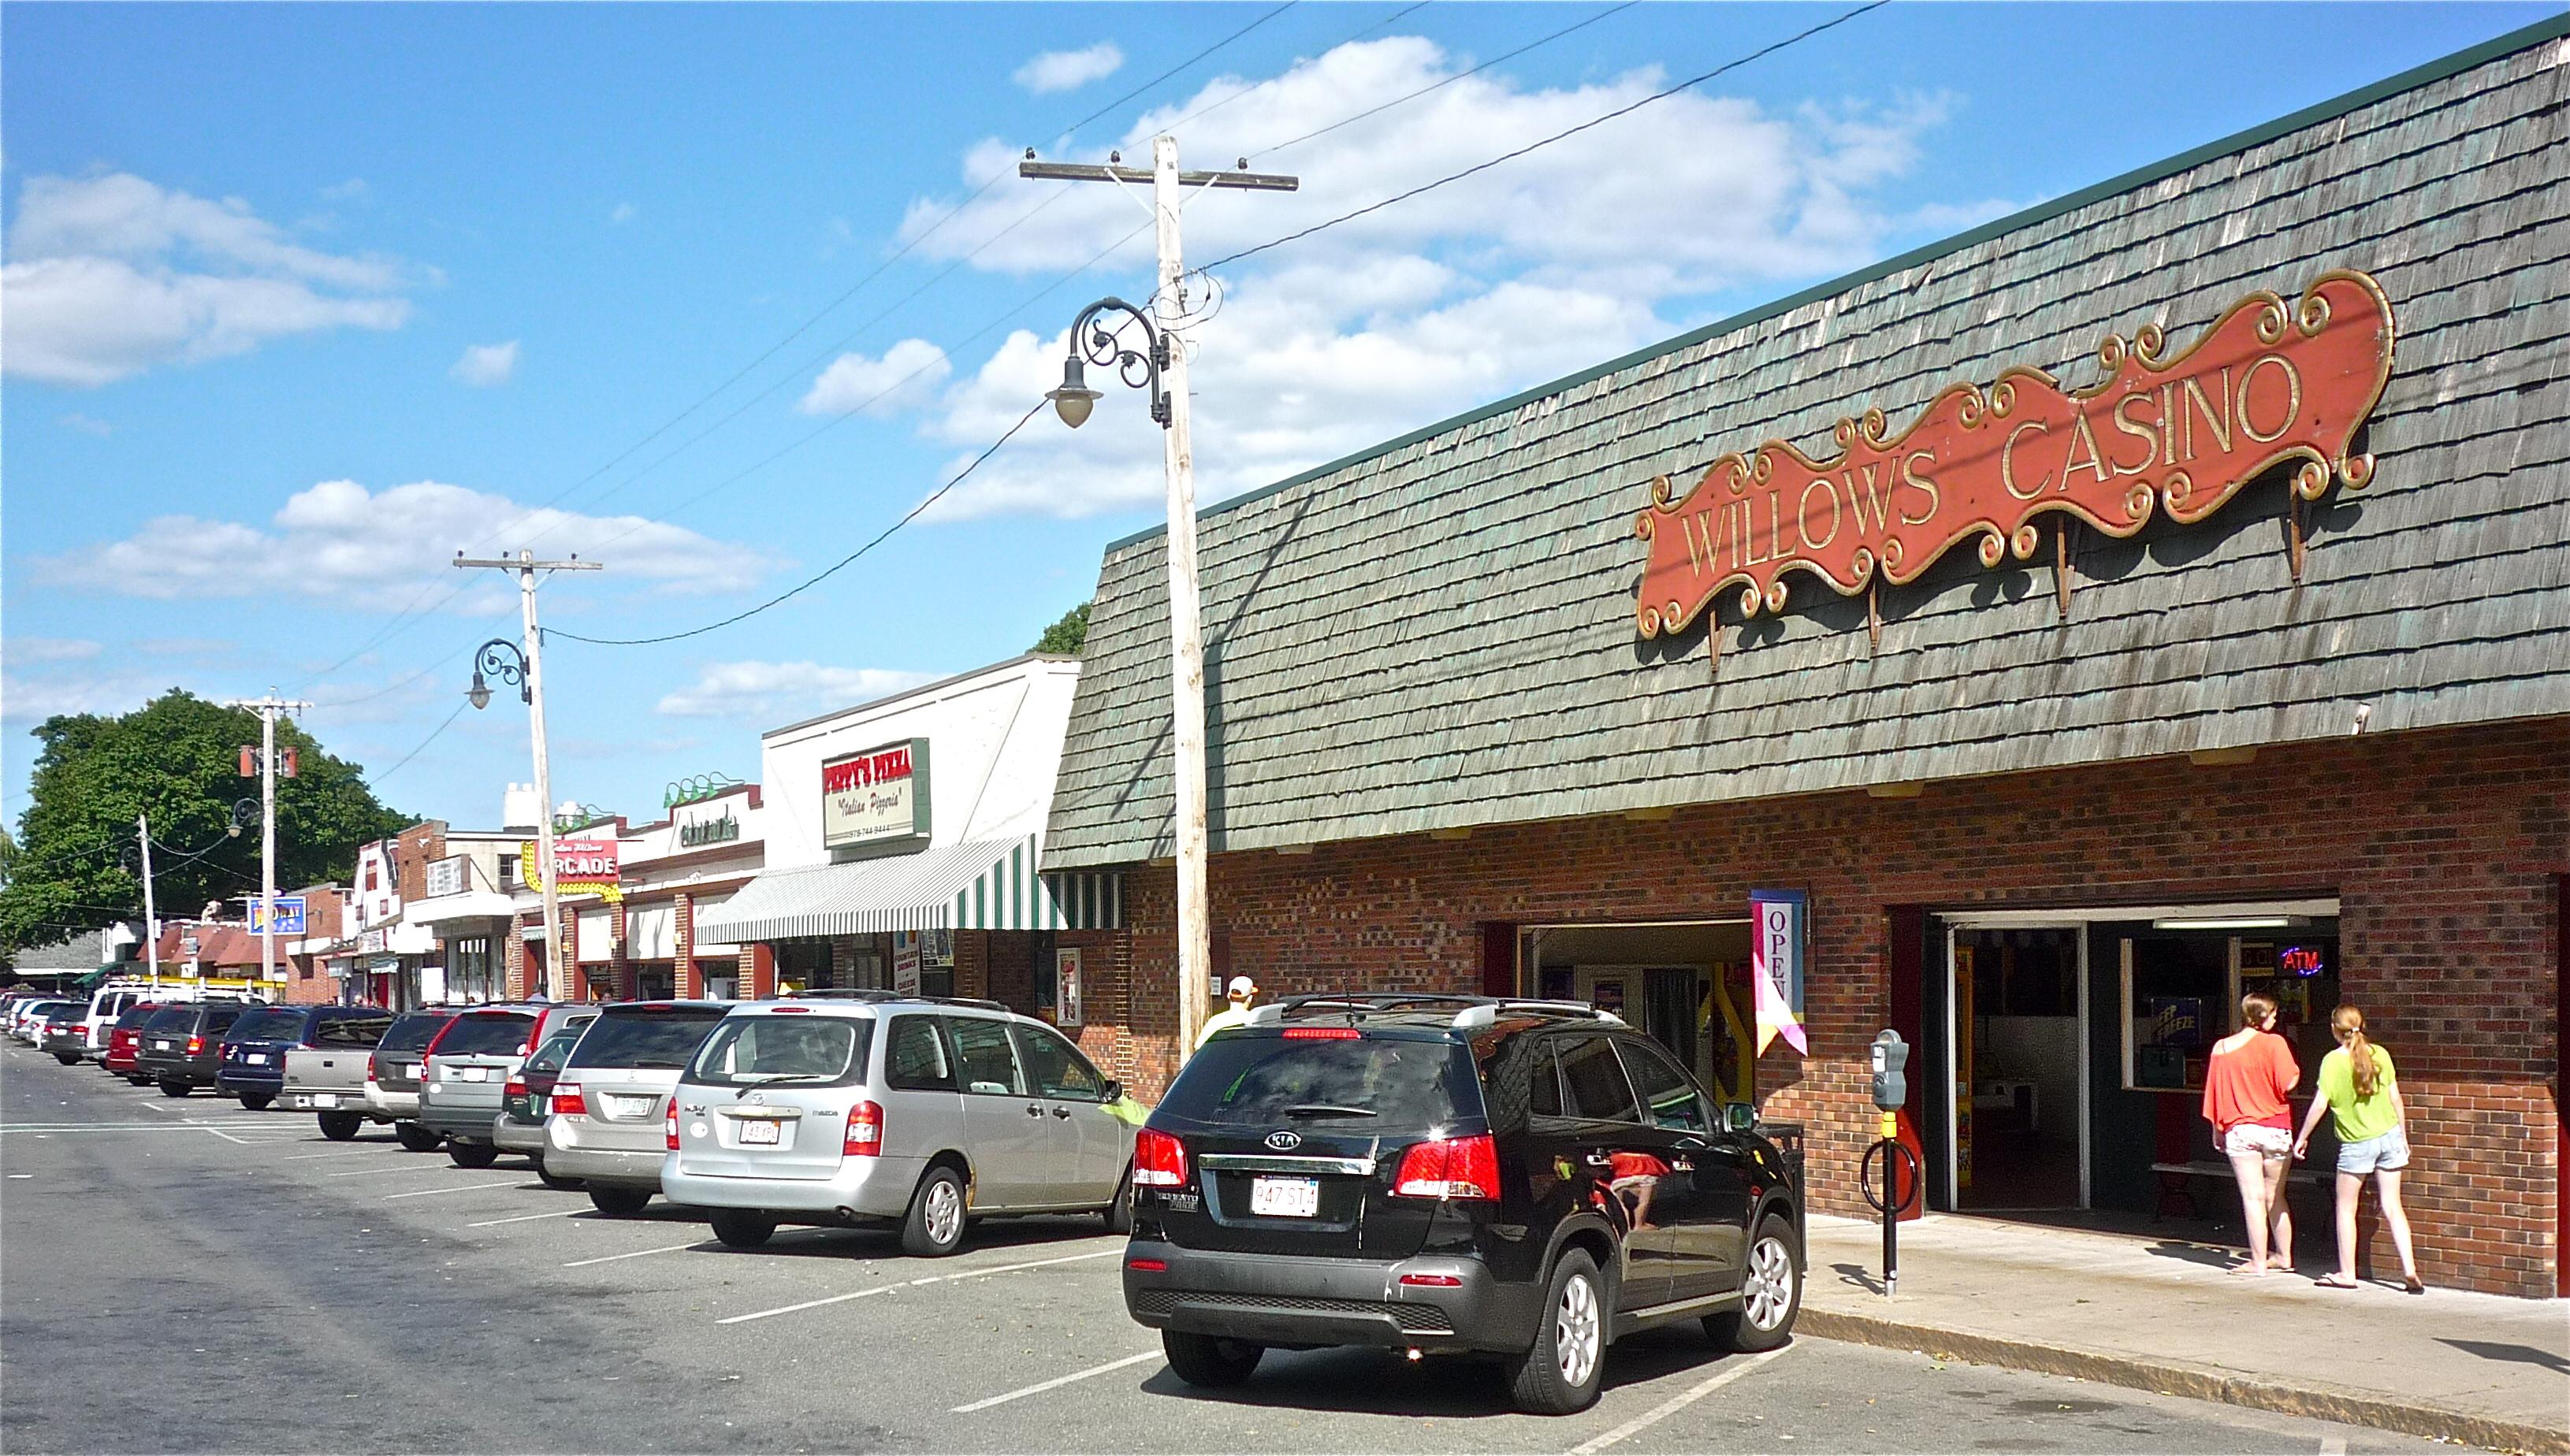 Salem Willows: Family-Fun Arcades, Park, Beach in Salem, Mass.